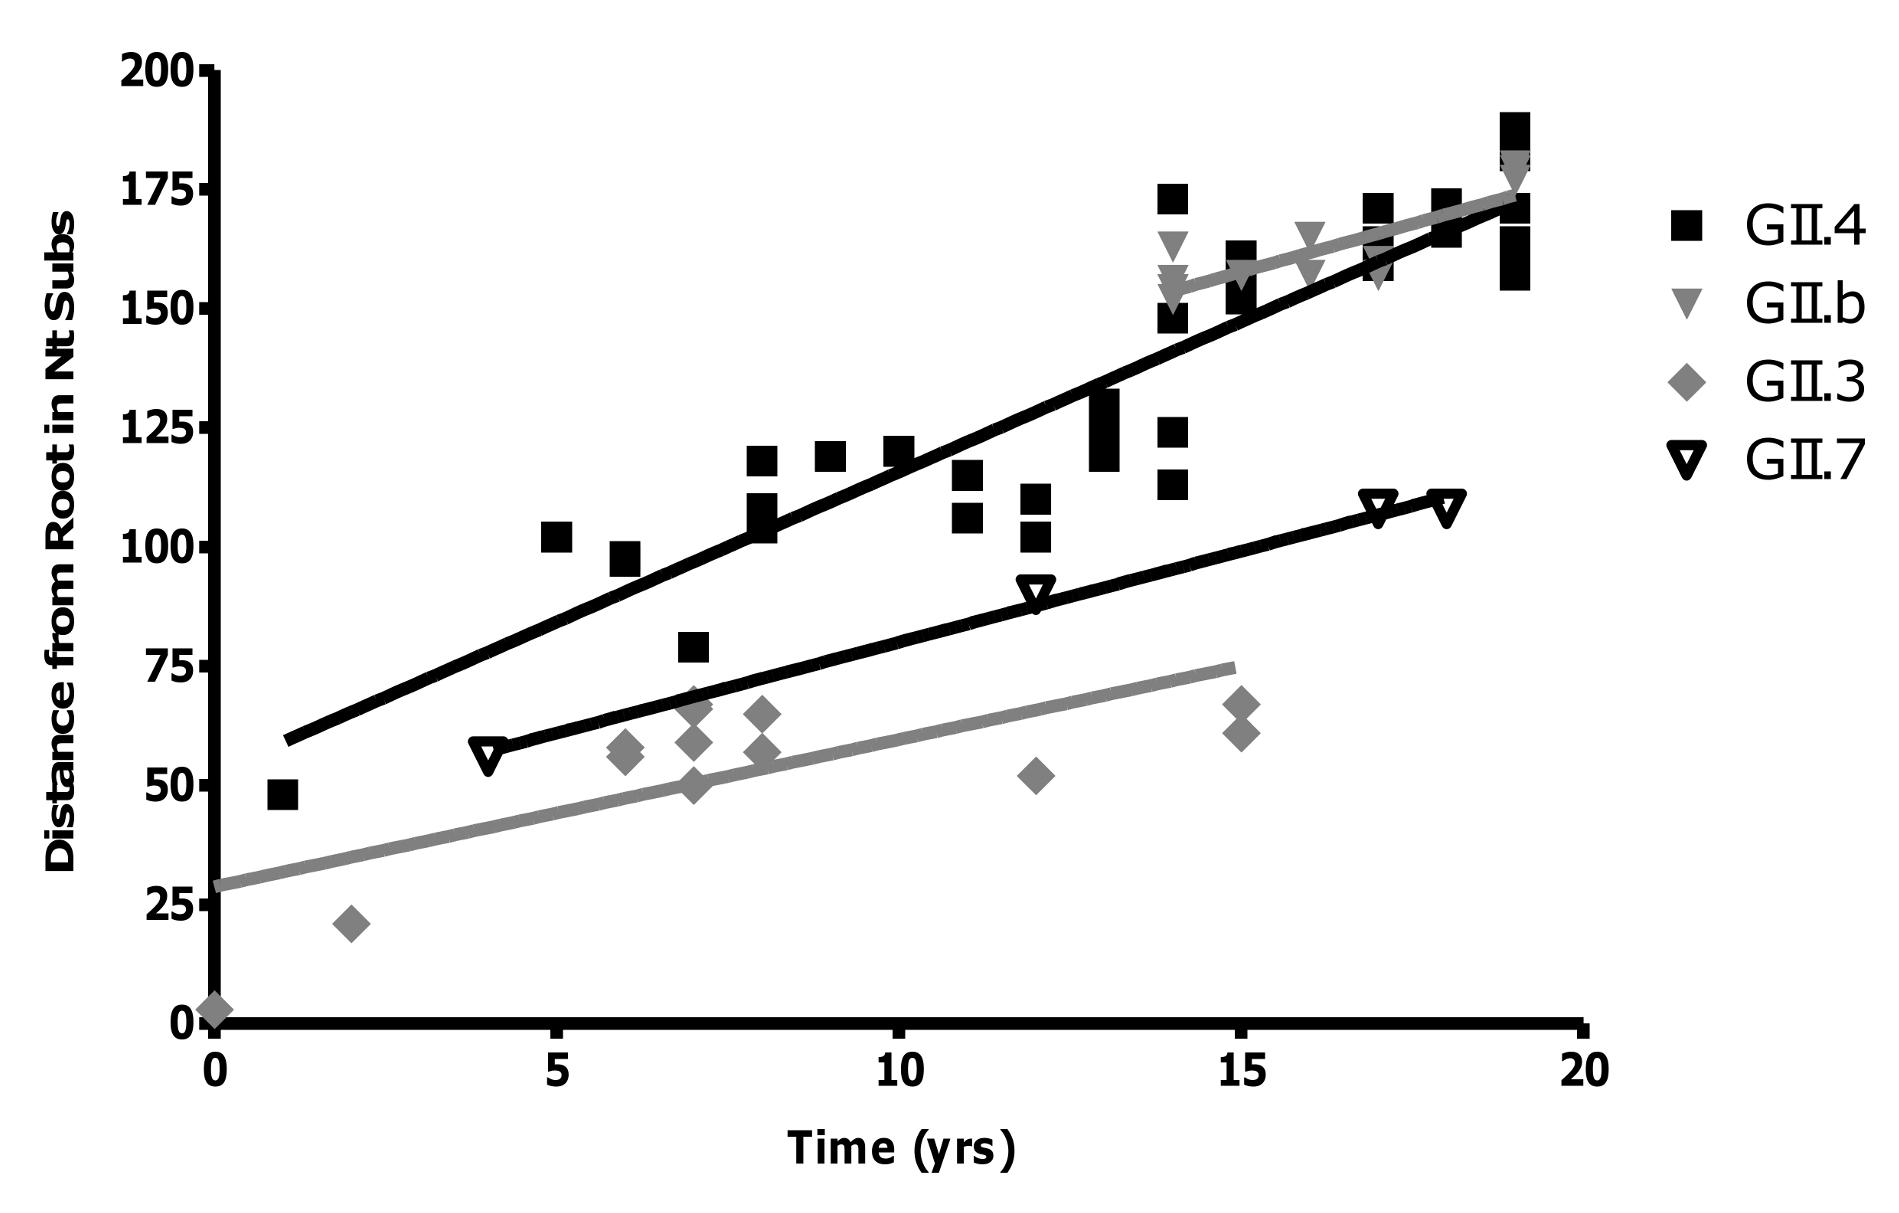 Rate of evolution for the GII.4, GII.7, GII.b/GII.3 and GII.3 strains.